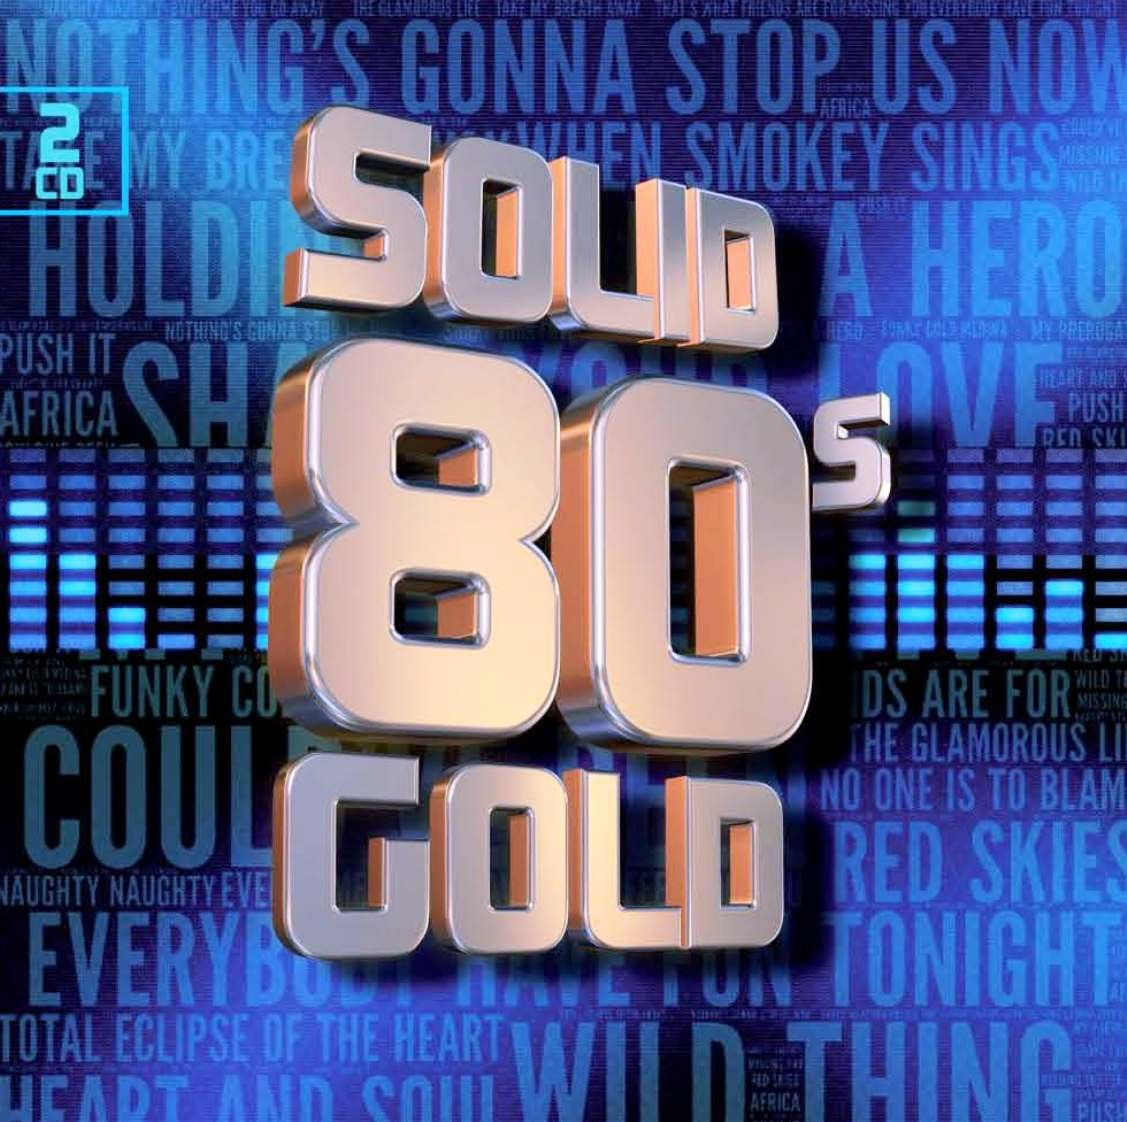 VA - Solid 80's Gold (2017) [FLAC] Download